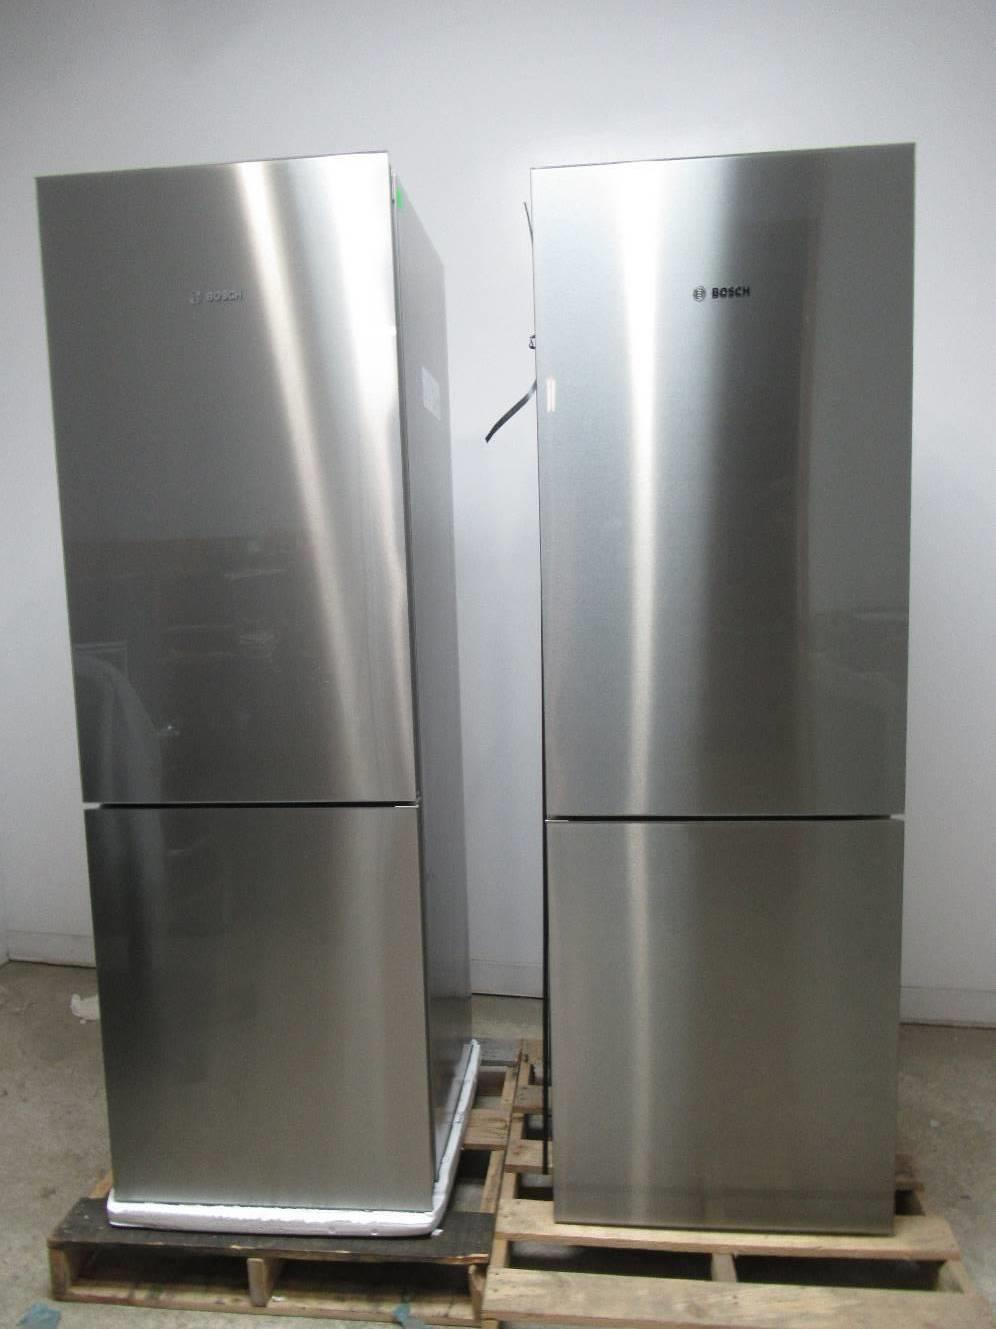 design fetched reviews counter refrigerator imaginative depth ideas refrigerators marvelous countertops far cabinet countertop kitchenaid icon